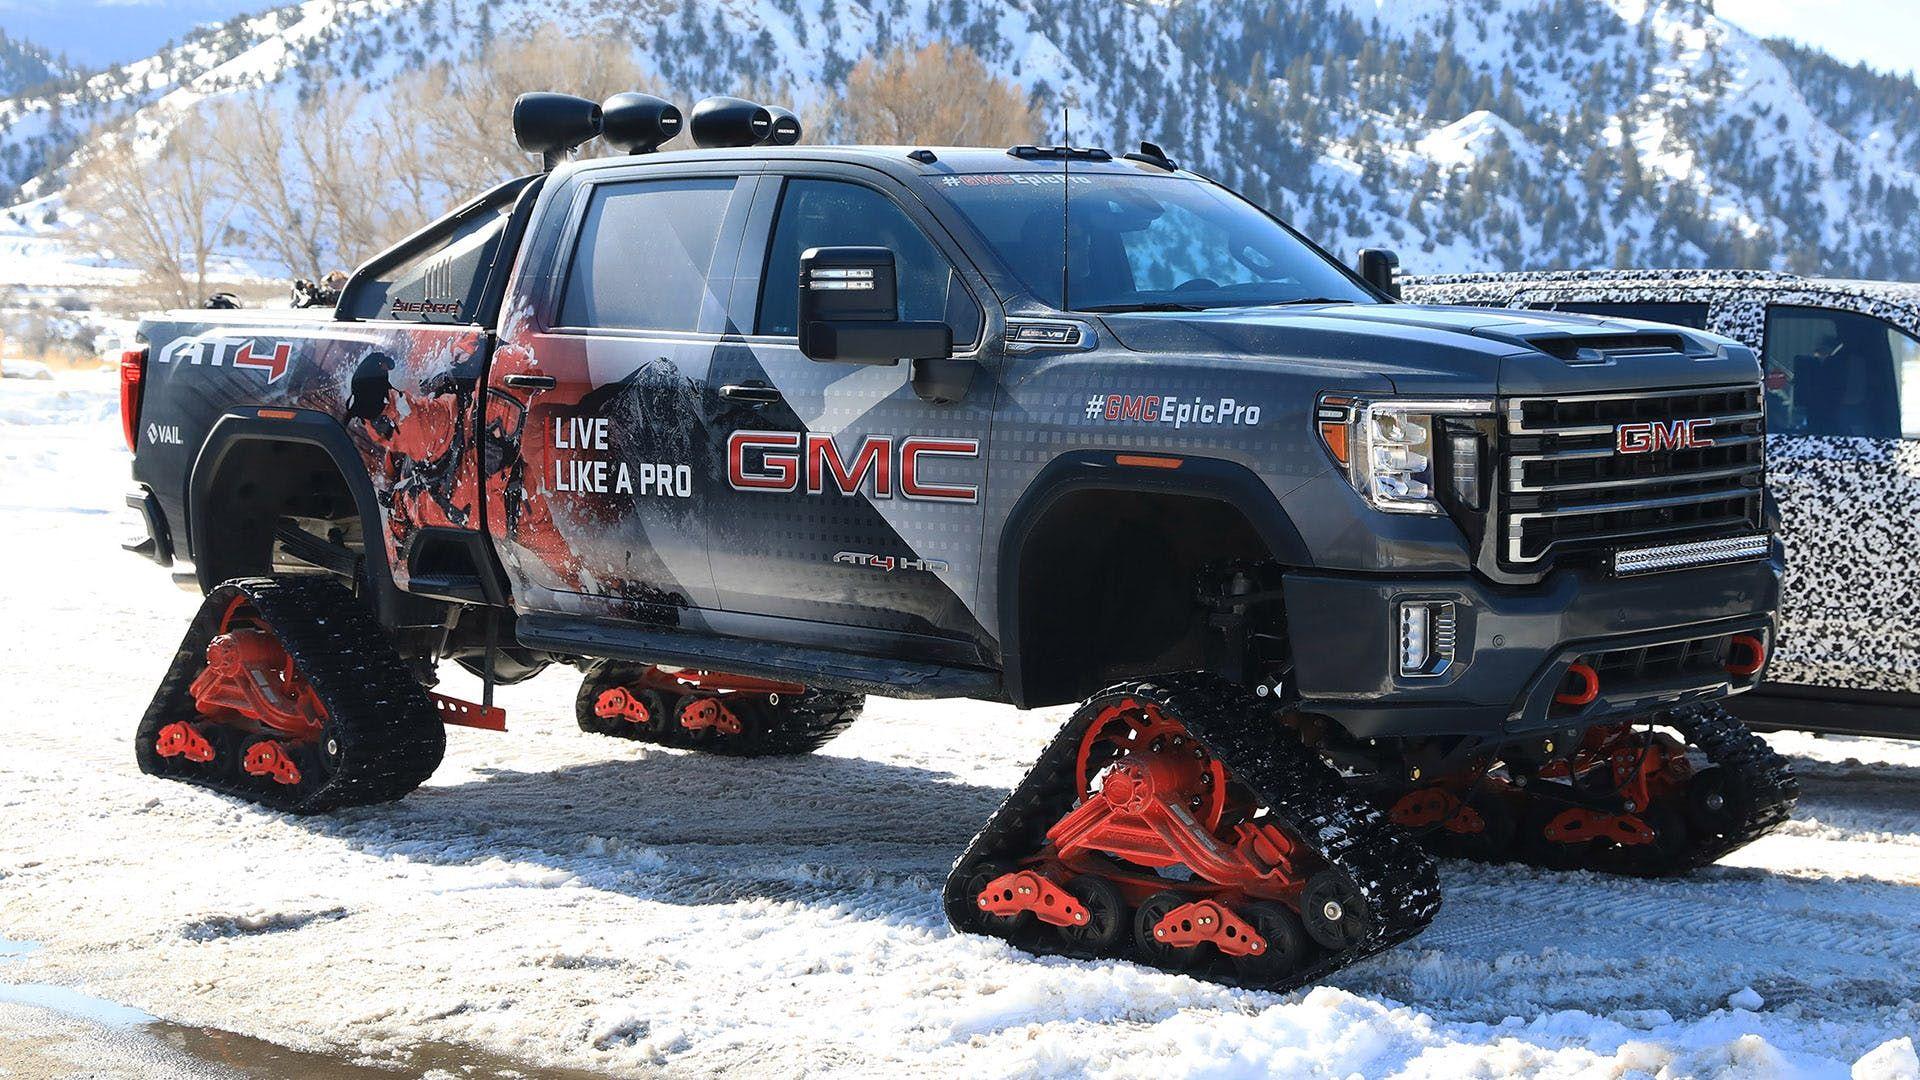 2020 Gmc Sierra Denali Hd All Mountain Review It S A Truck On Tank Tracks People The Drive In 2020 Gmc Sierra Denali Sierra Denali Denali Hd